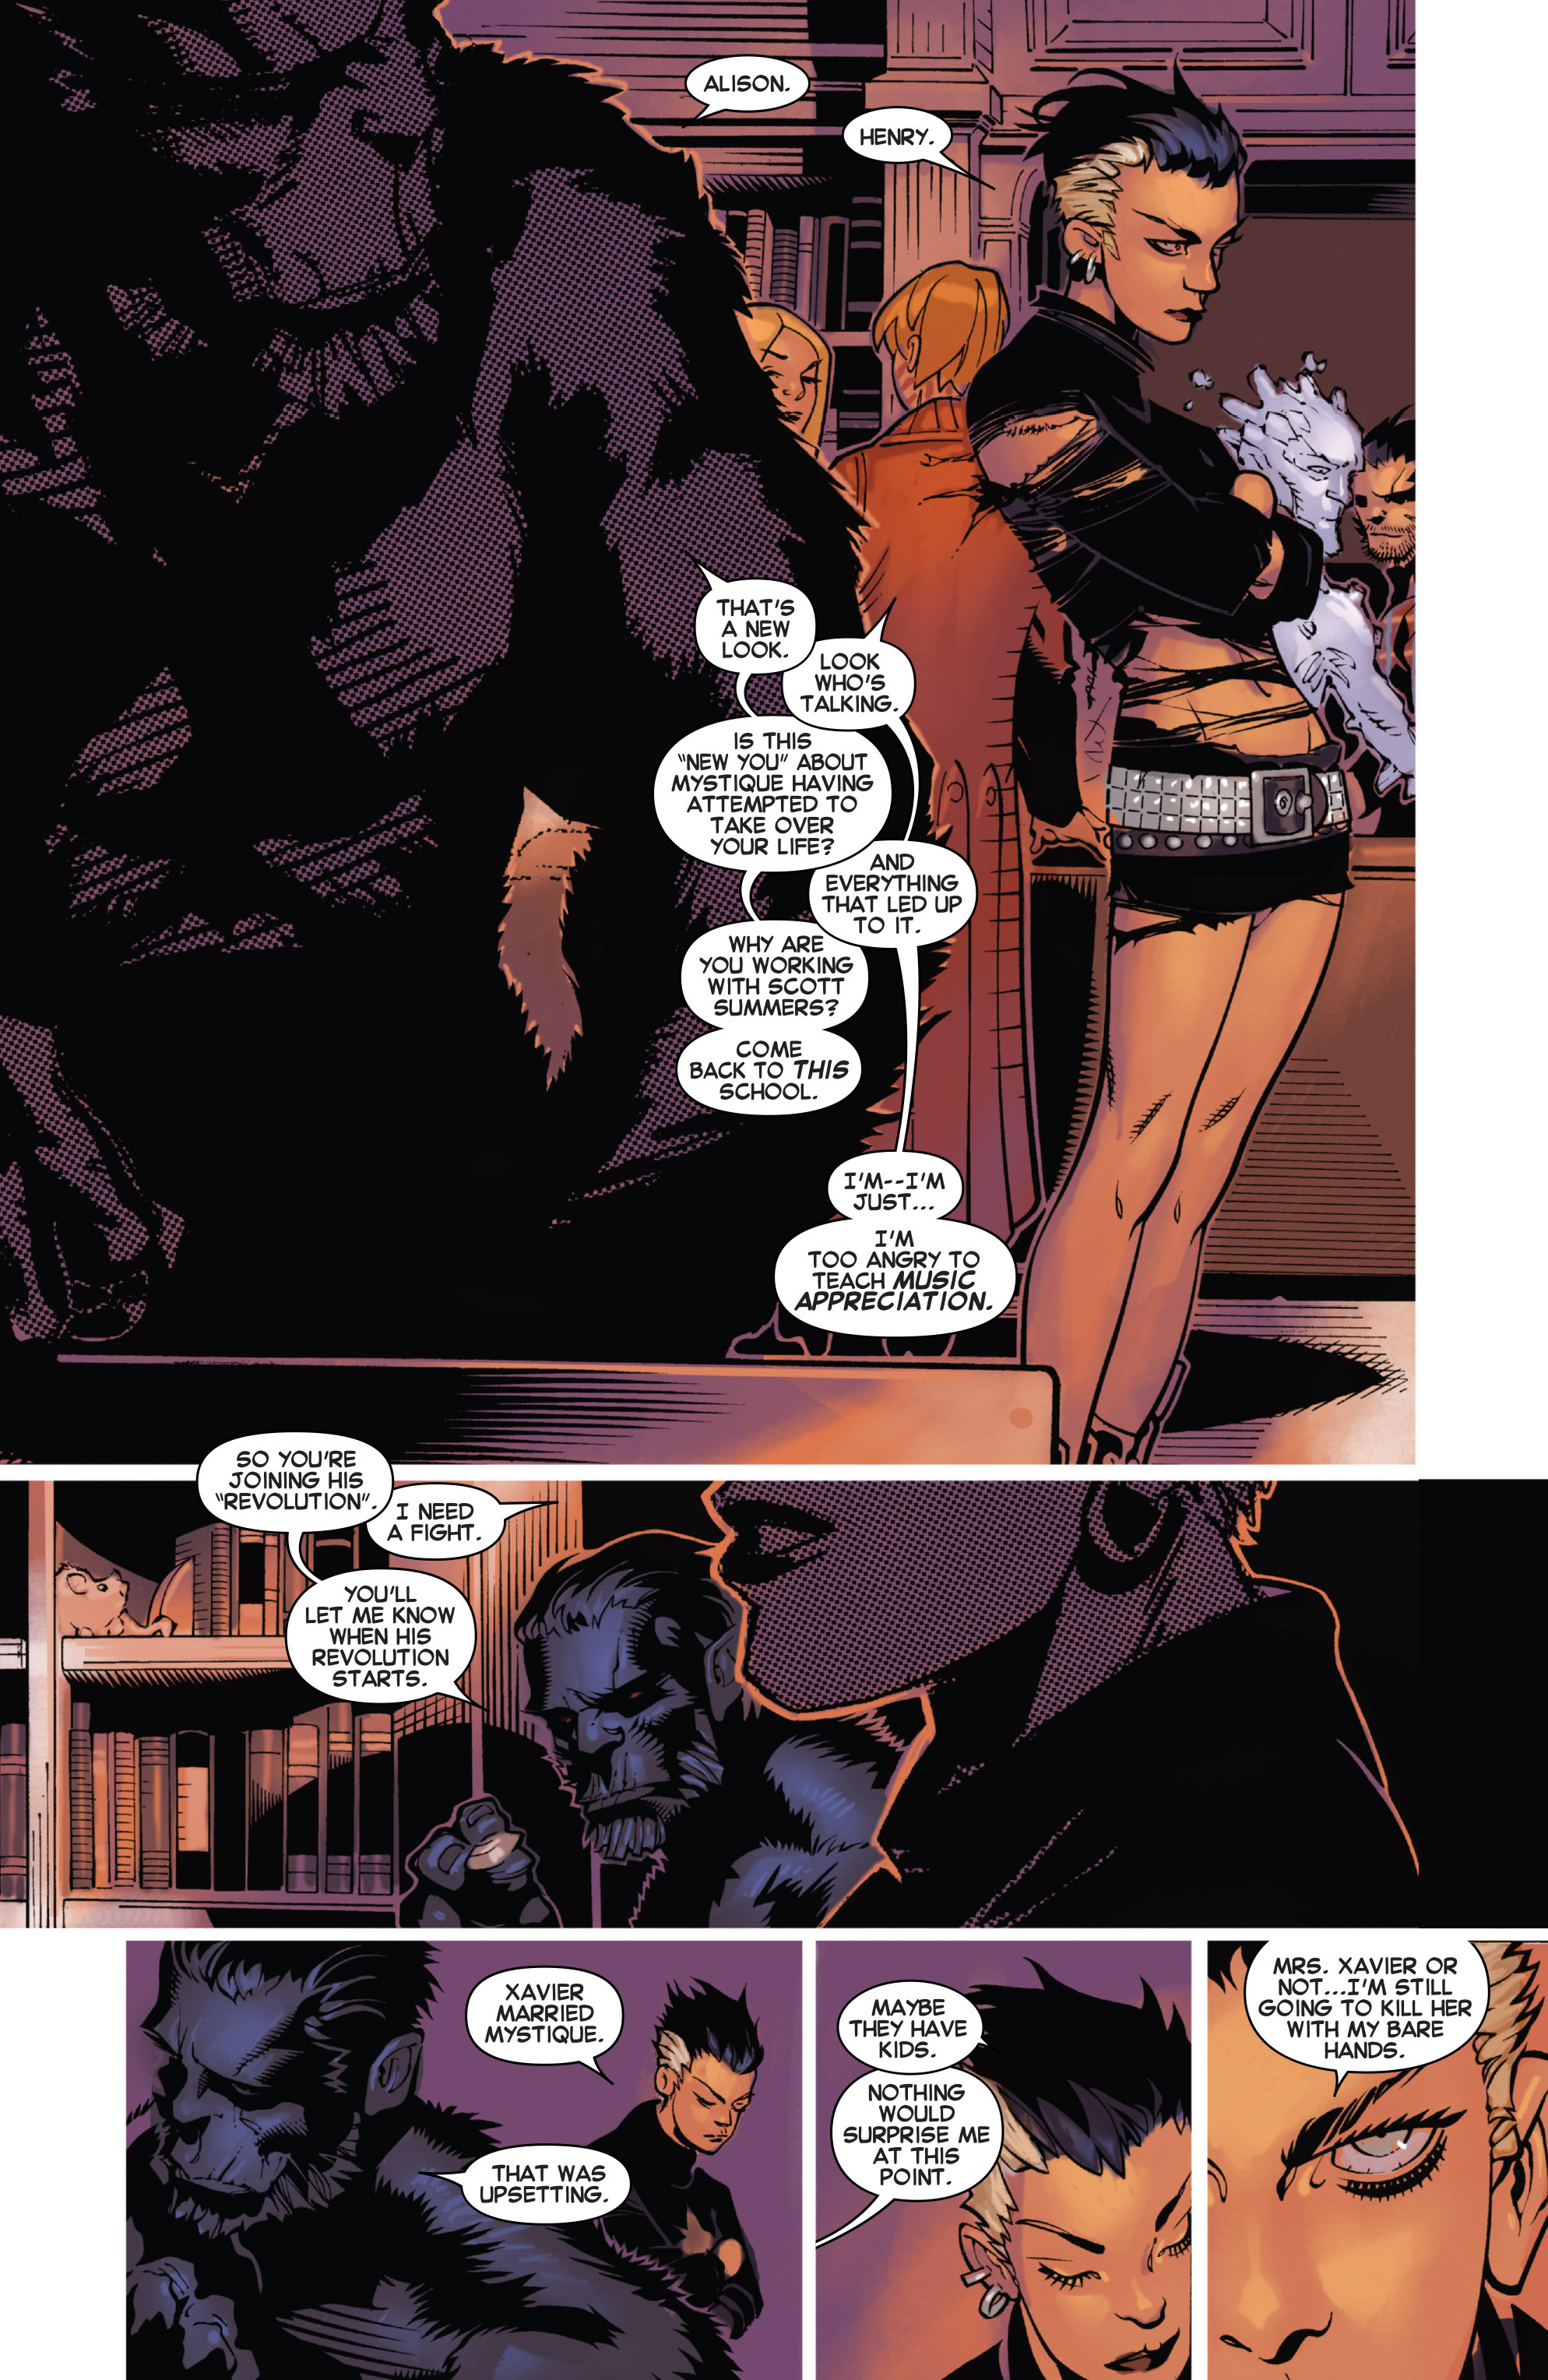 Read online Uncanny X-Men (2013) comic -  Issue # _TPB 4 - vs. S.H.I.E.L.D - 126